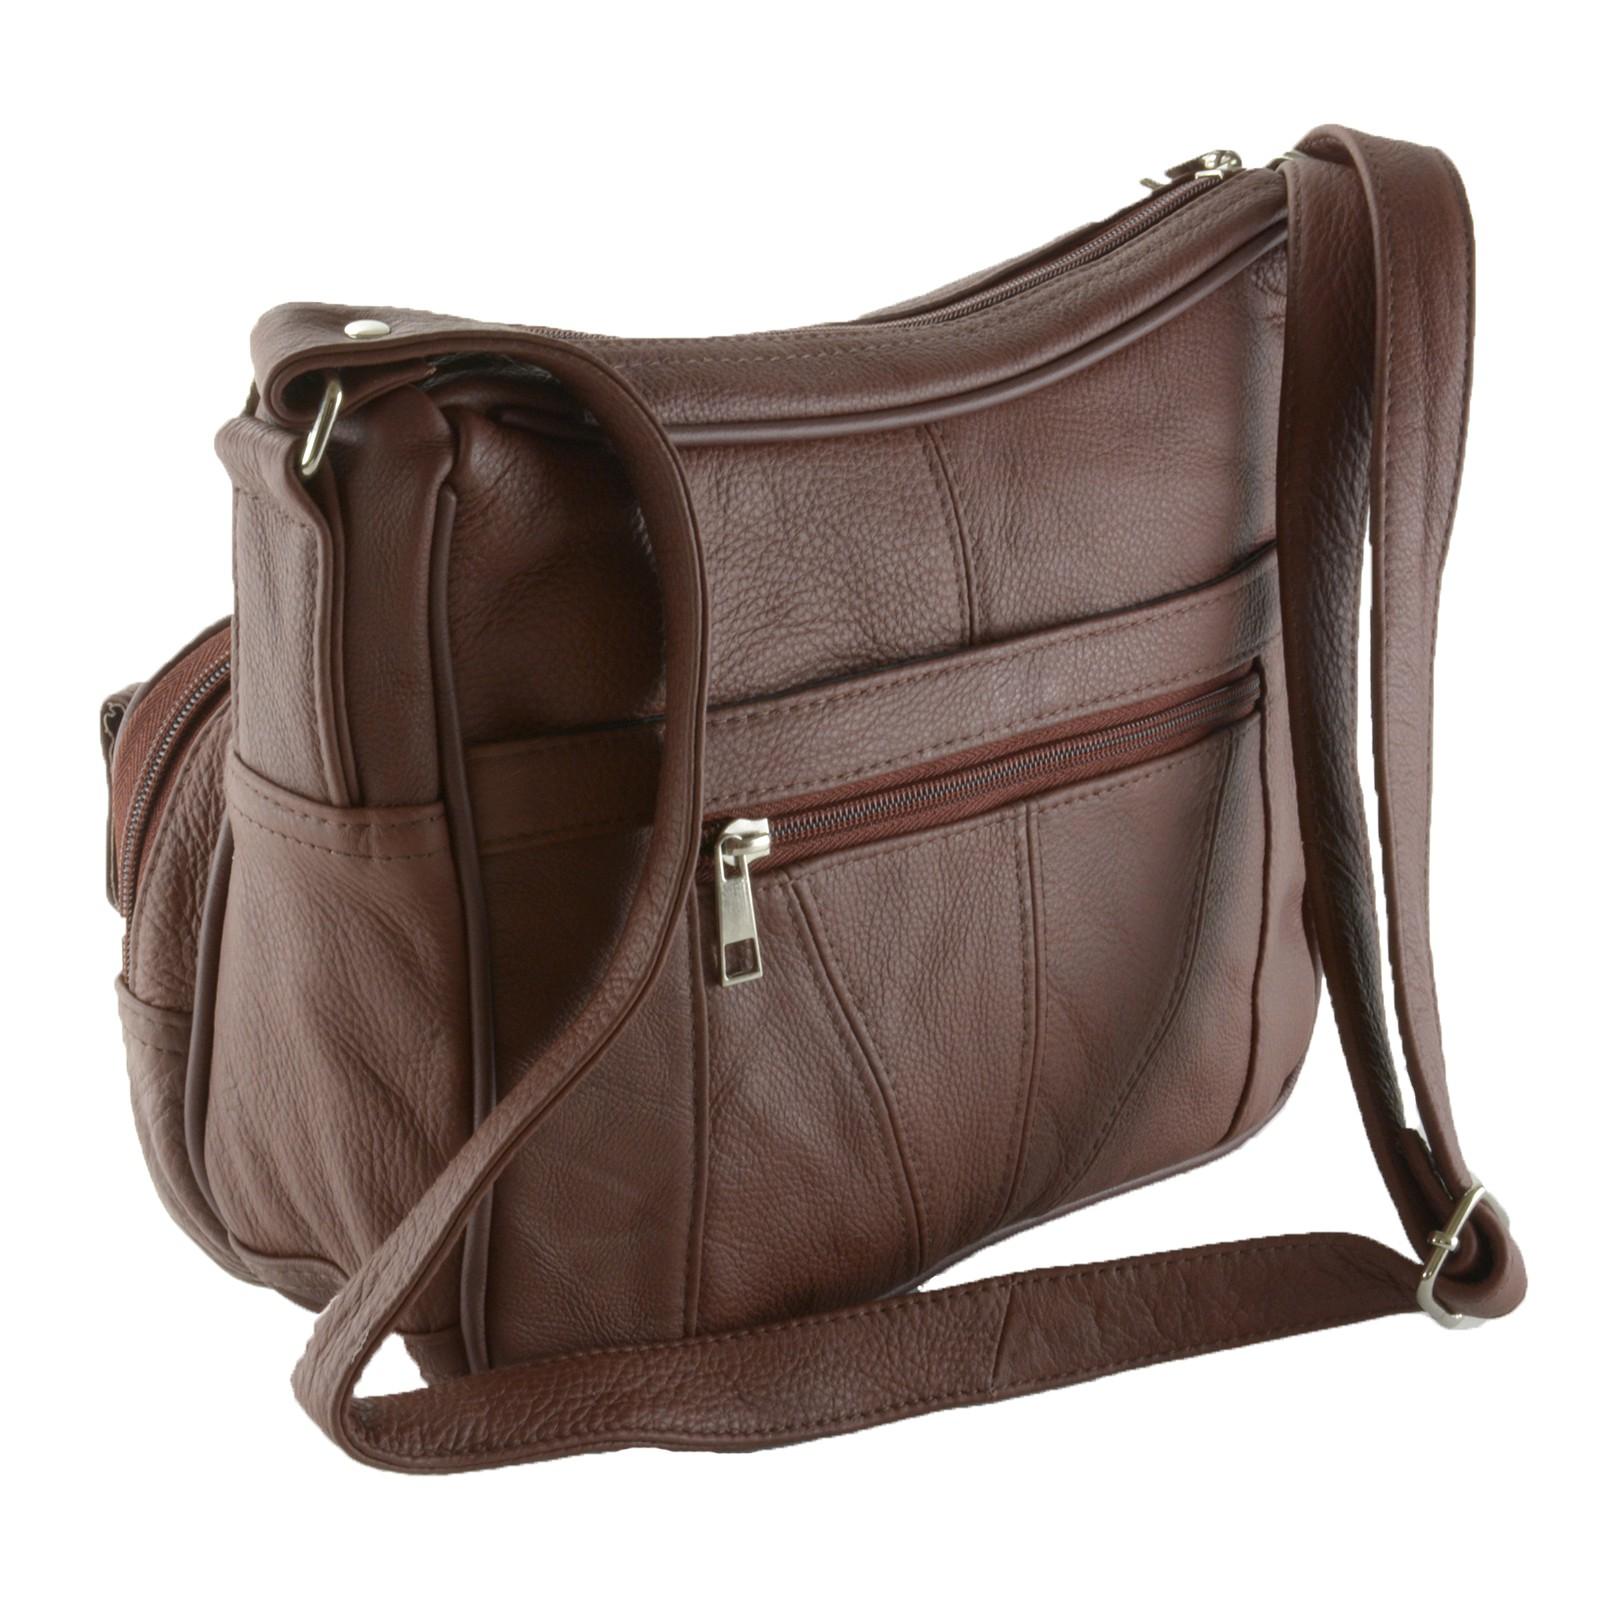 Women s Leather Organizer Purse Shoulder Bag Multiple Pockets Cross ... 14fdf116b9234